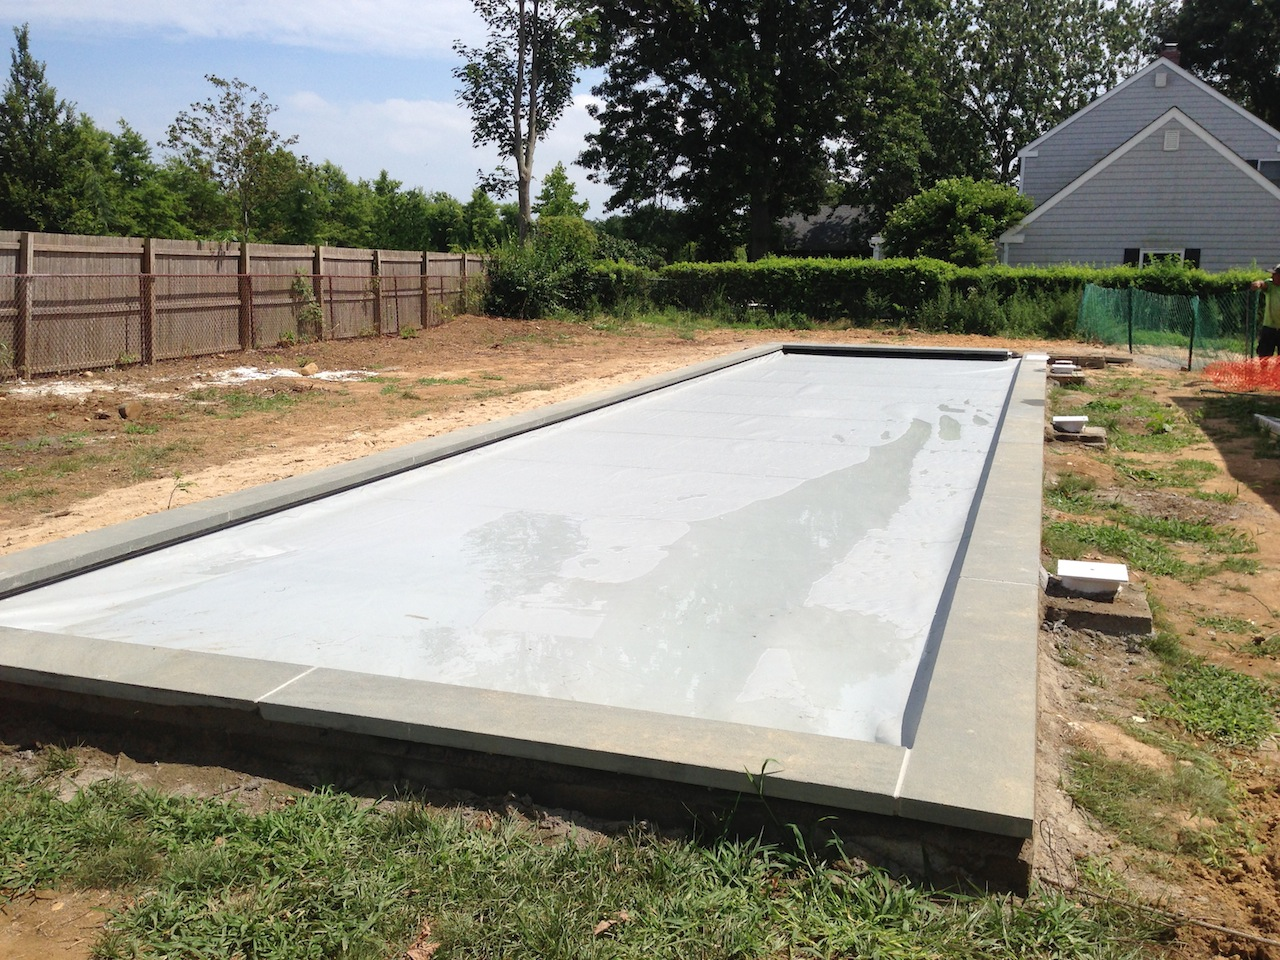 Northfork orient point gunite lap pool installation for Pool installation